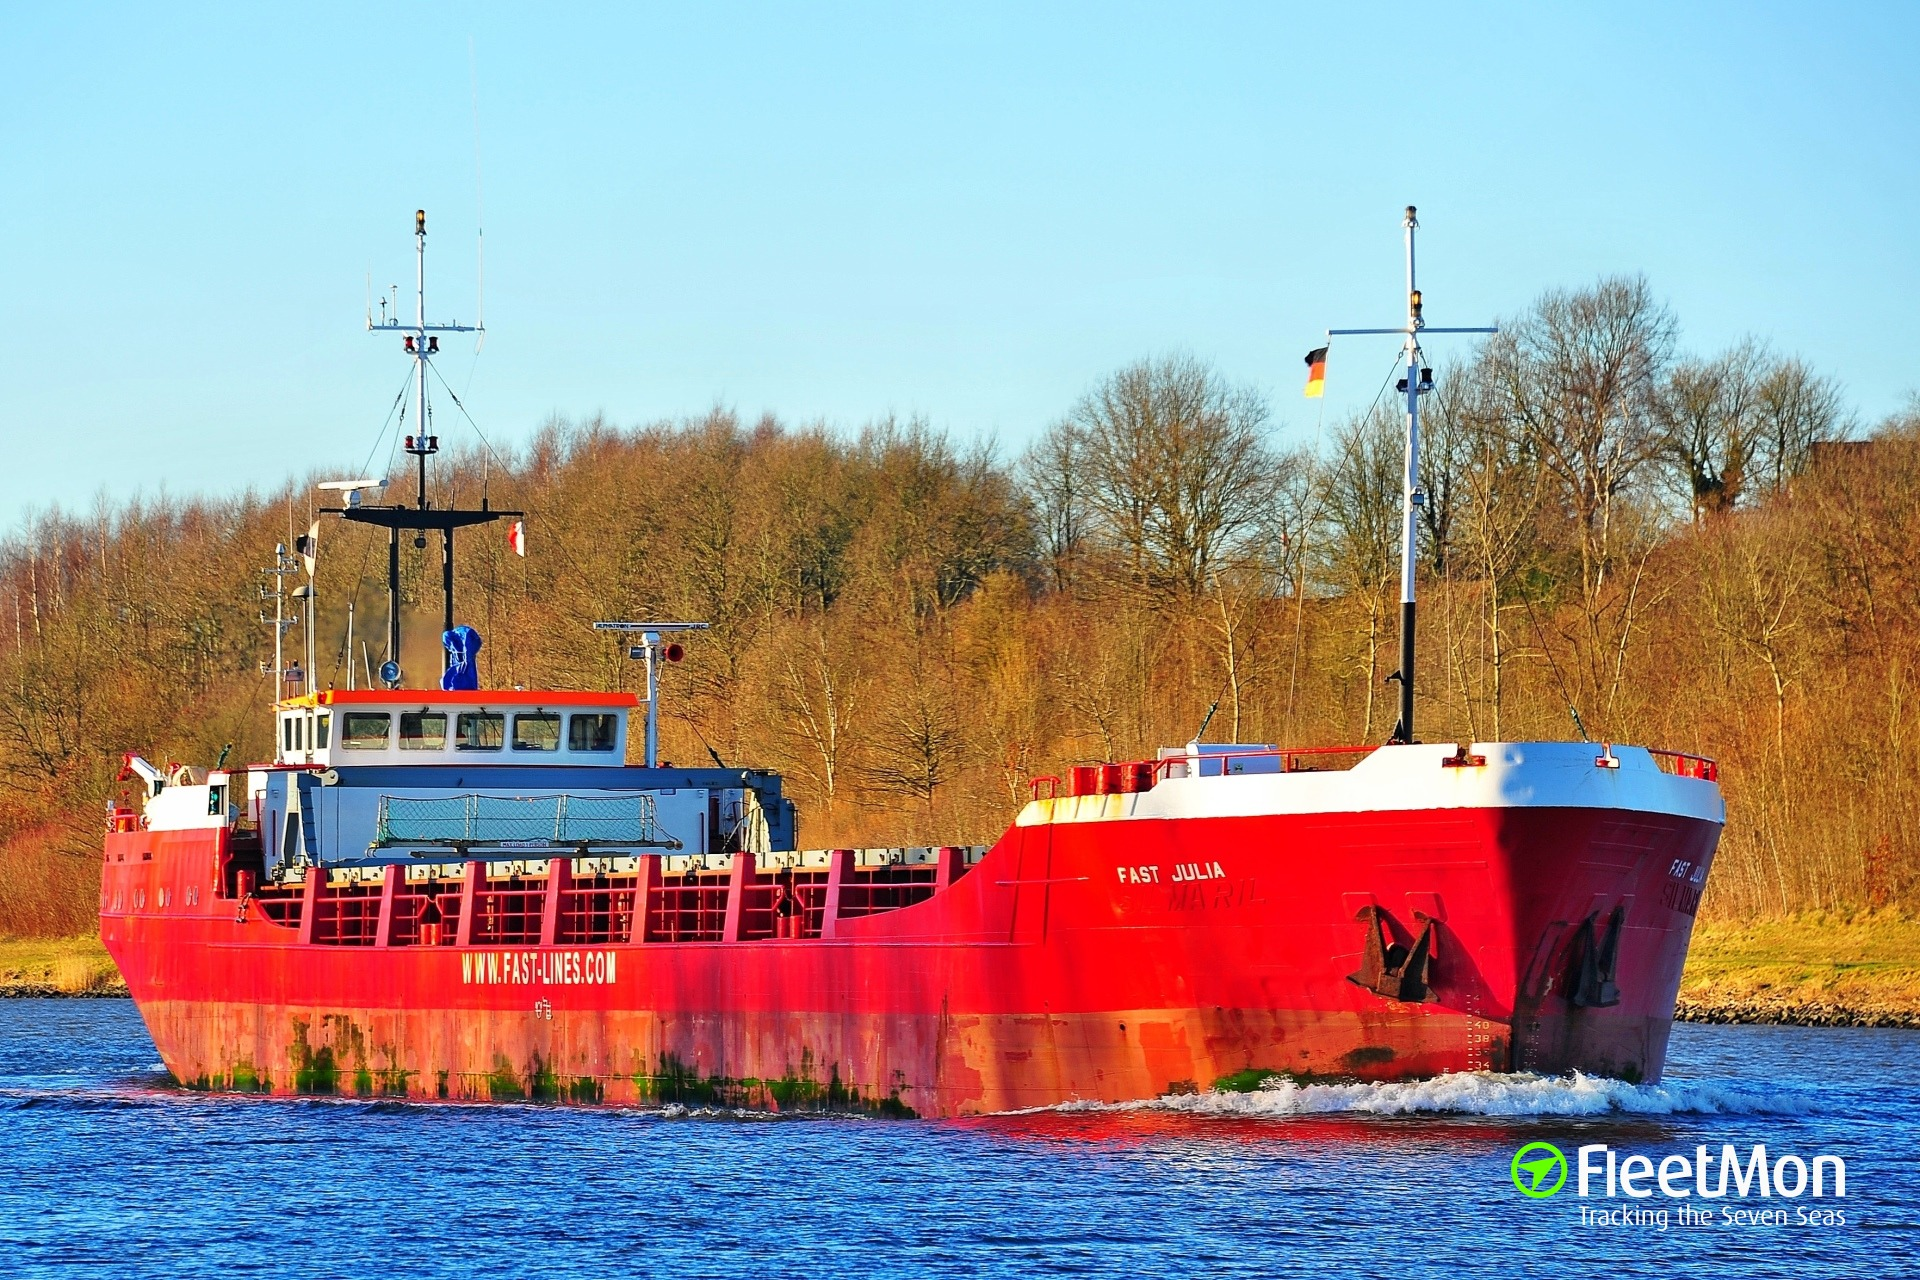 General cargo vessel Fast Julia grounding